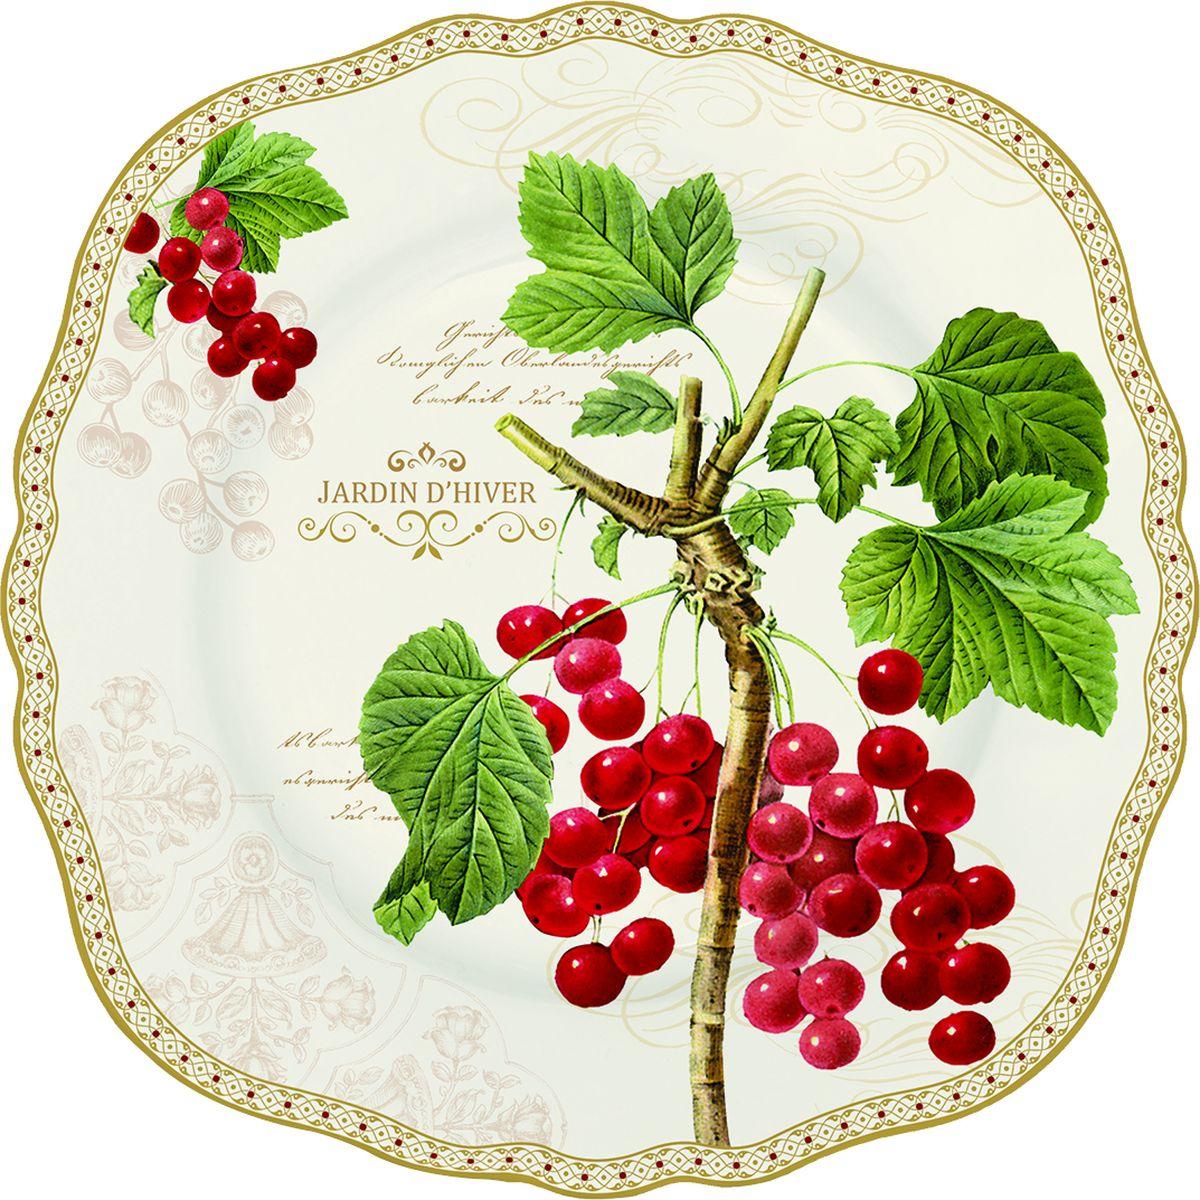 Тарелка Easy Life Красная смородина, EL-1176/JADI, десертная, диаметр 20 см